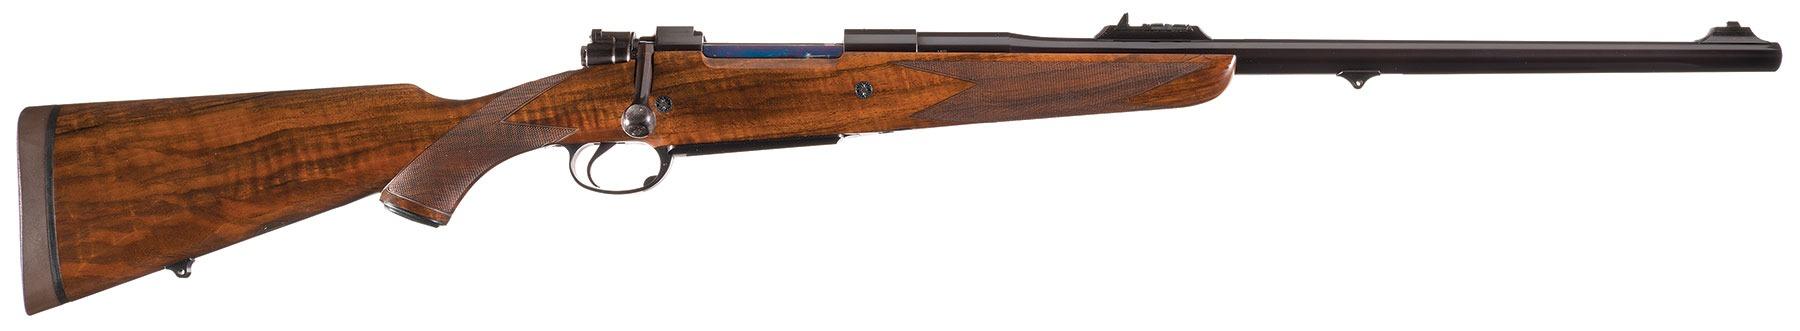 Jeffery dangerous game rifle